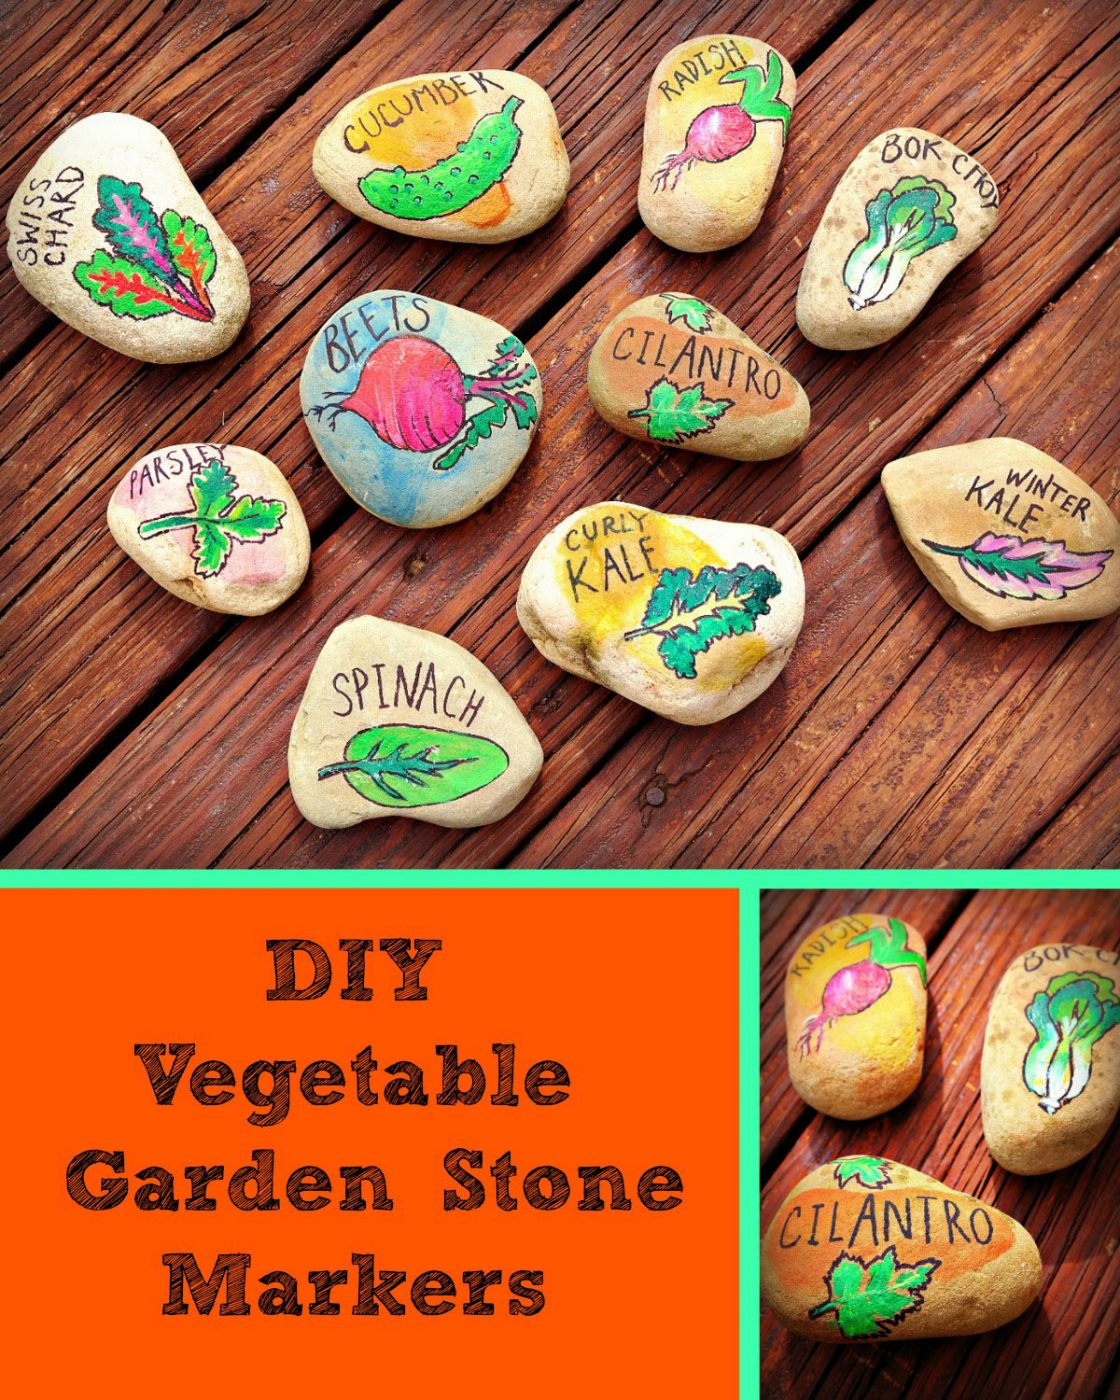 DIY Vegetable Garden Stone Markers